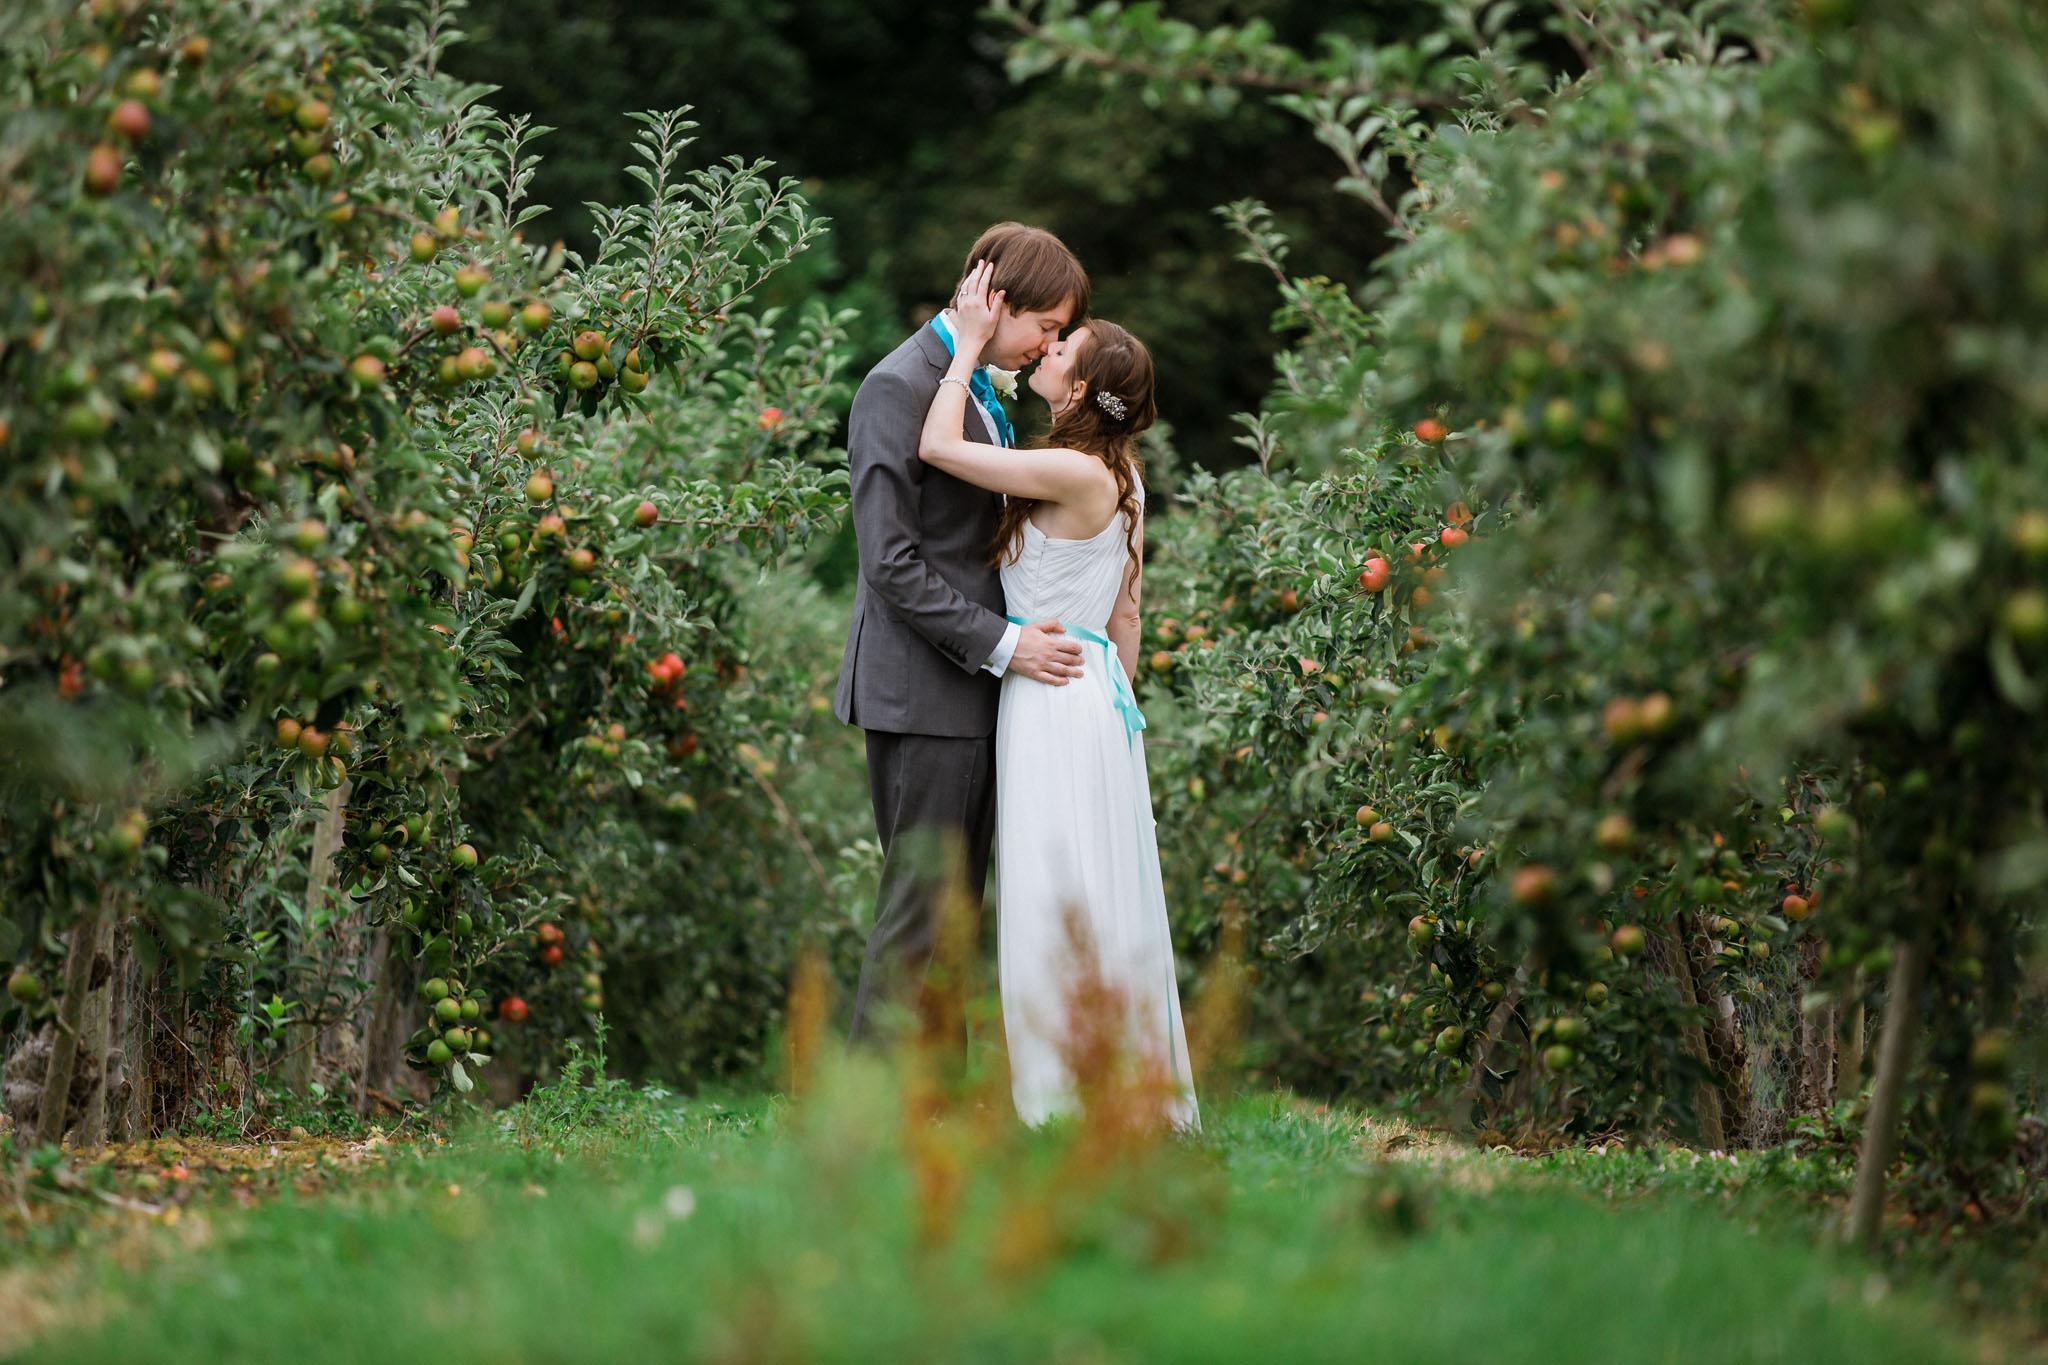 54 - Dan & Jess - The MulBerry Tree - Kent Wedding - 160815 - EMS11334.jpg